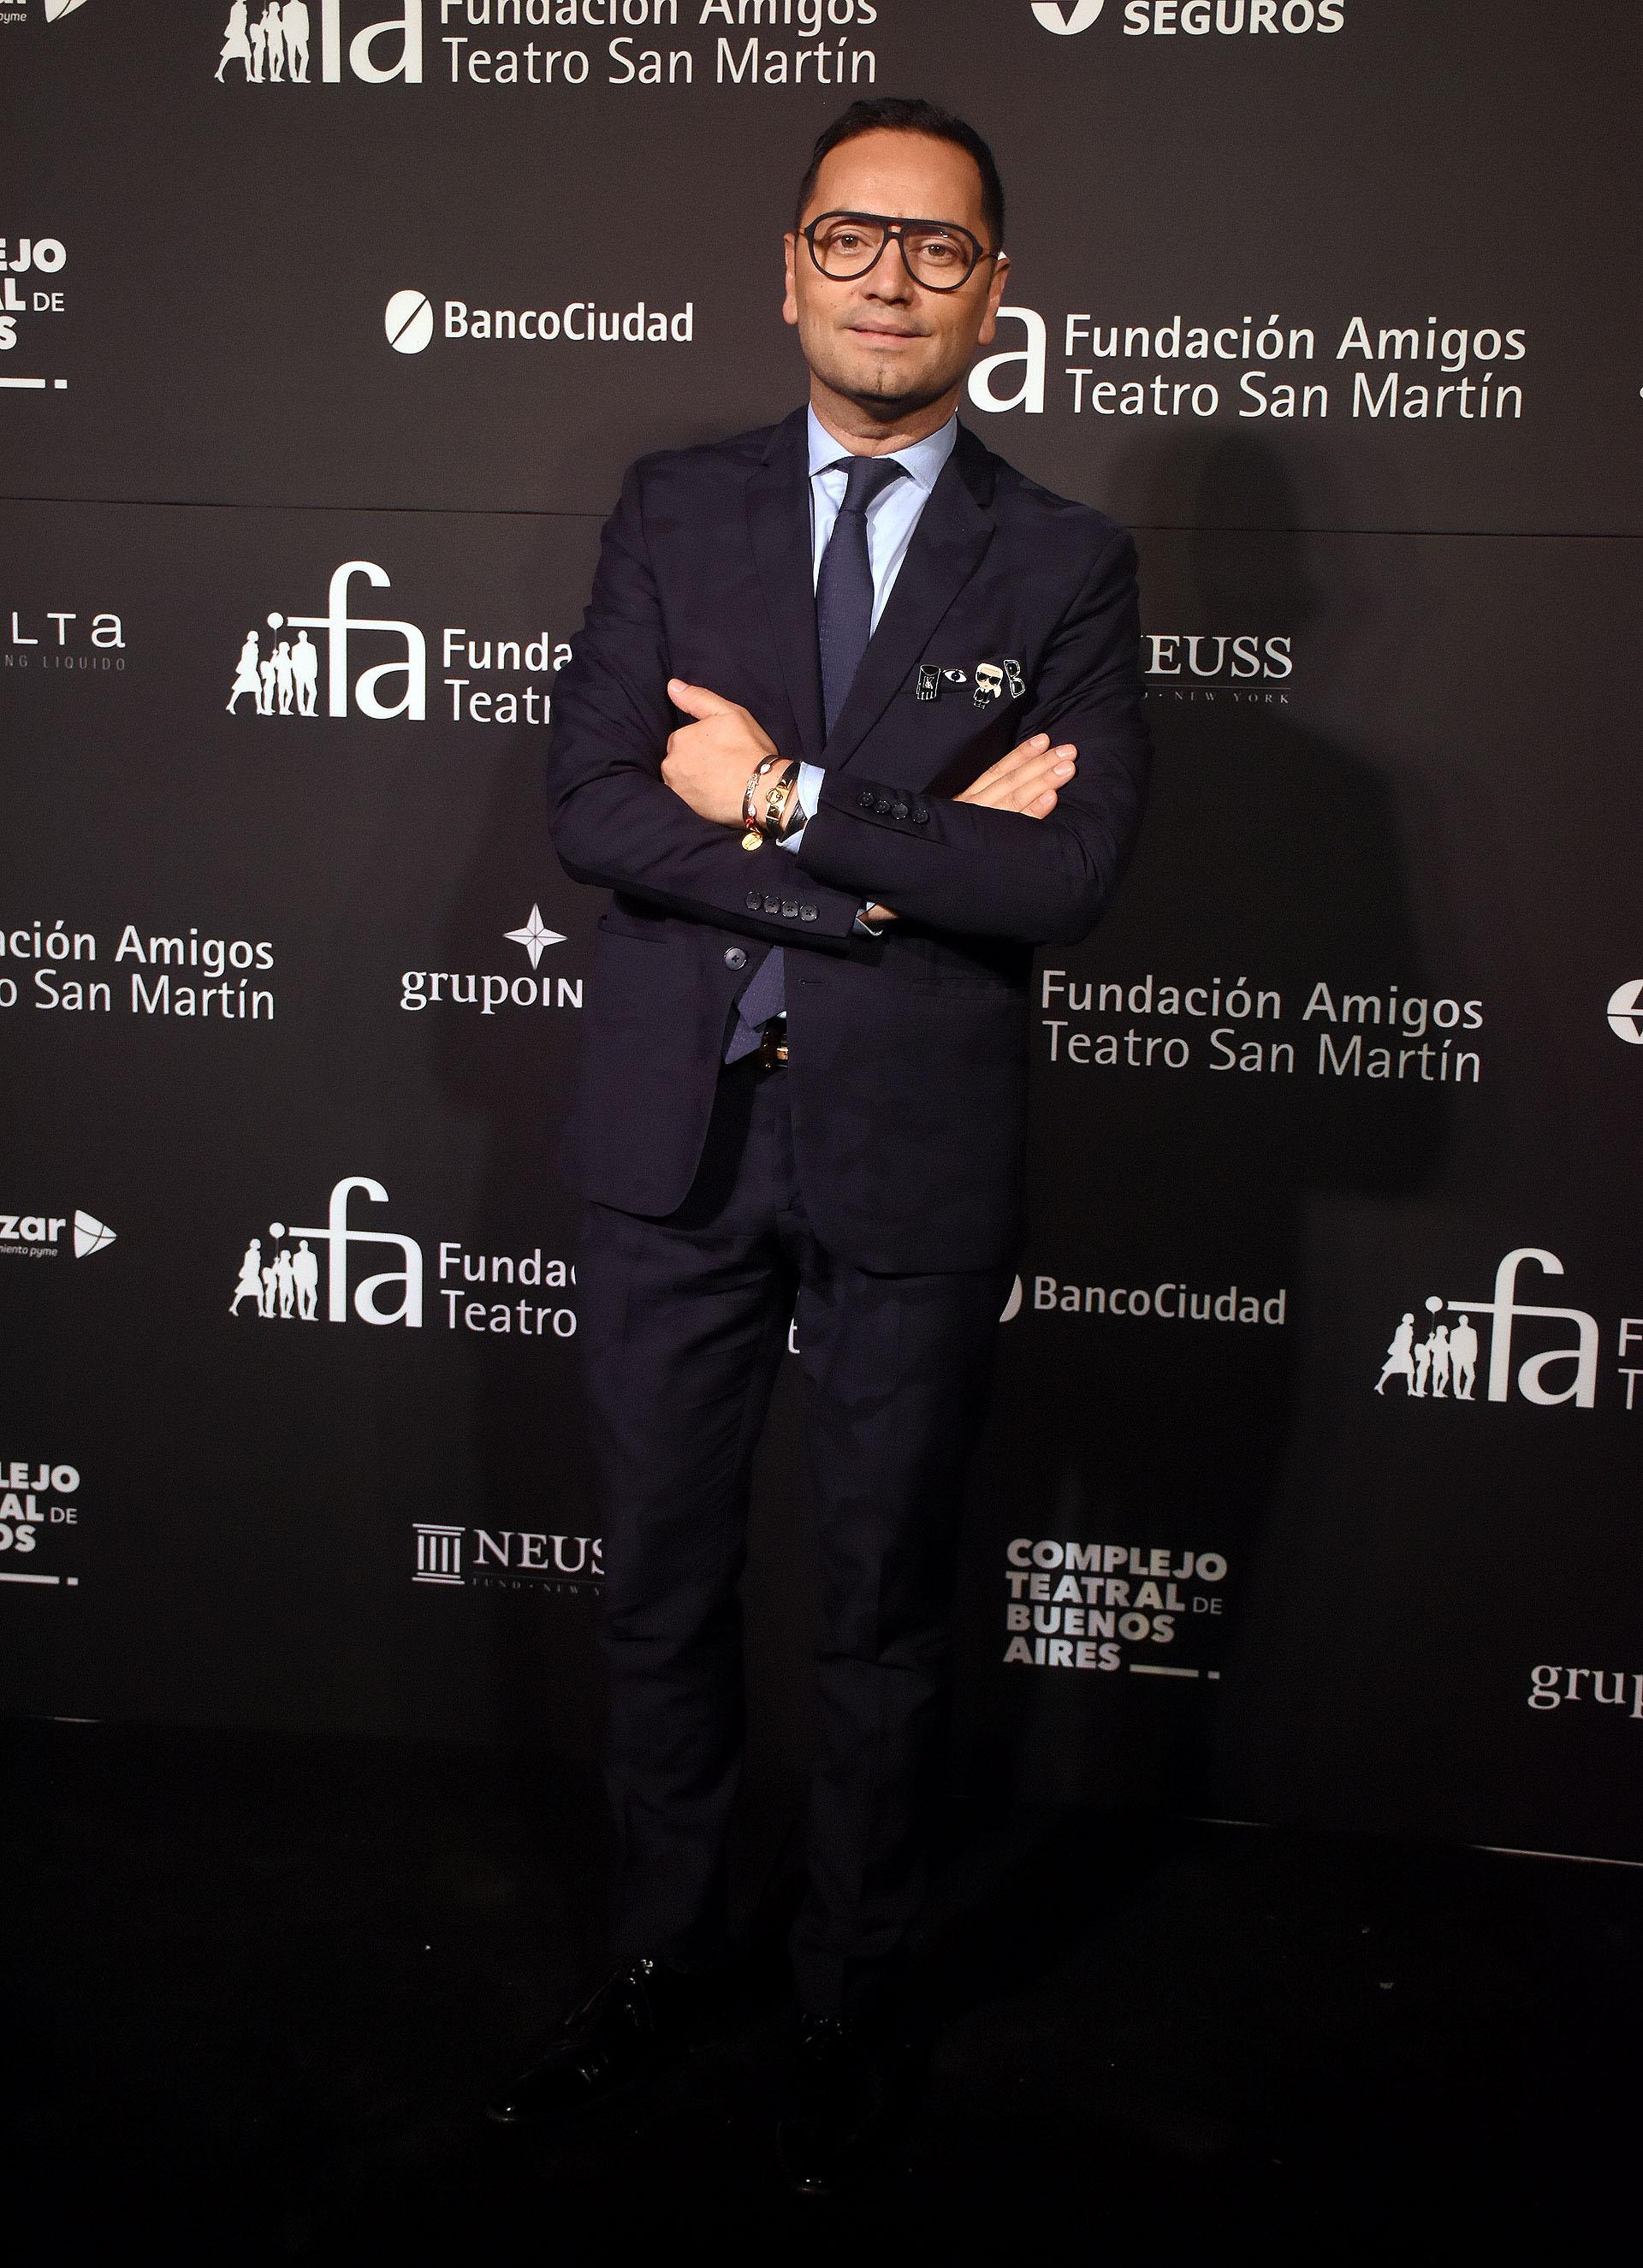 Fabián Medina Flores //// Fotos: Nicolás Stulberg- Gustavo Gavotti